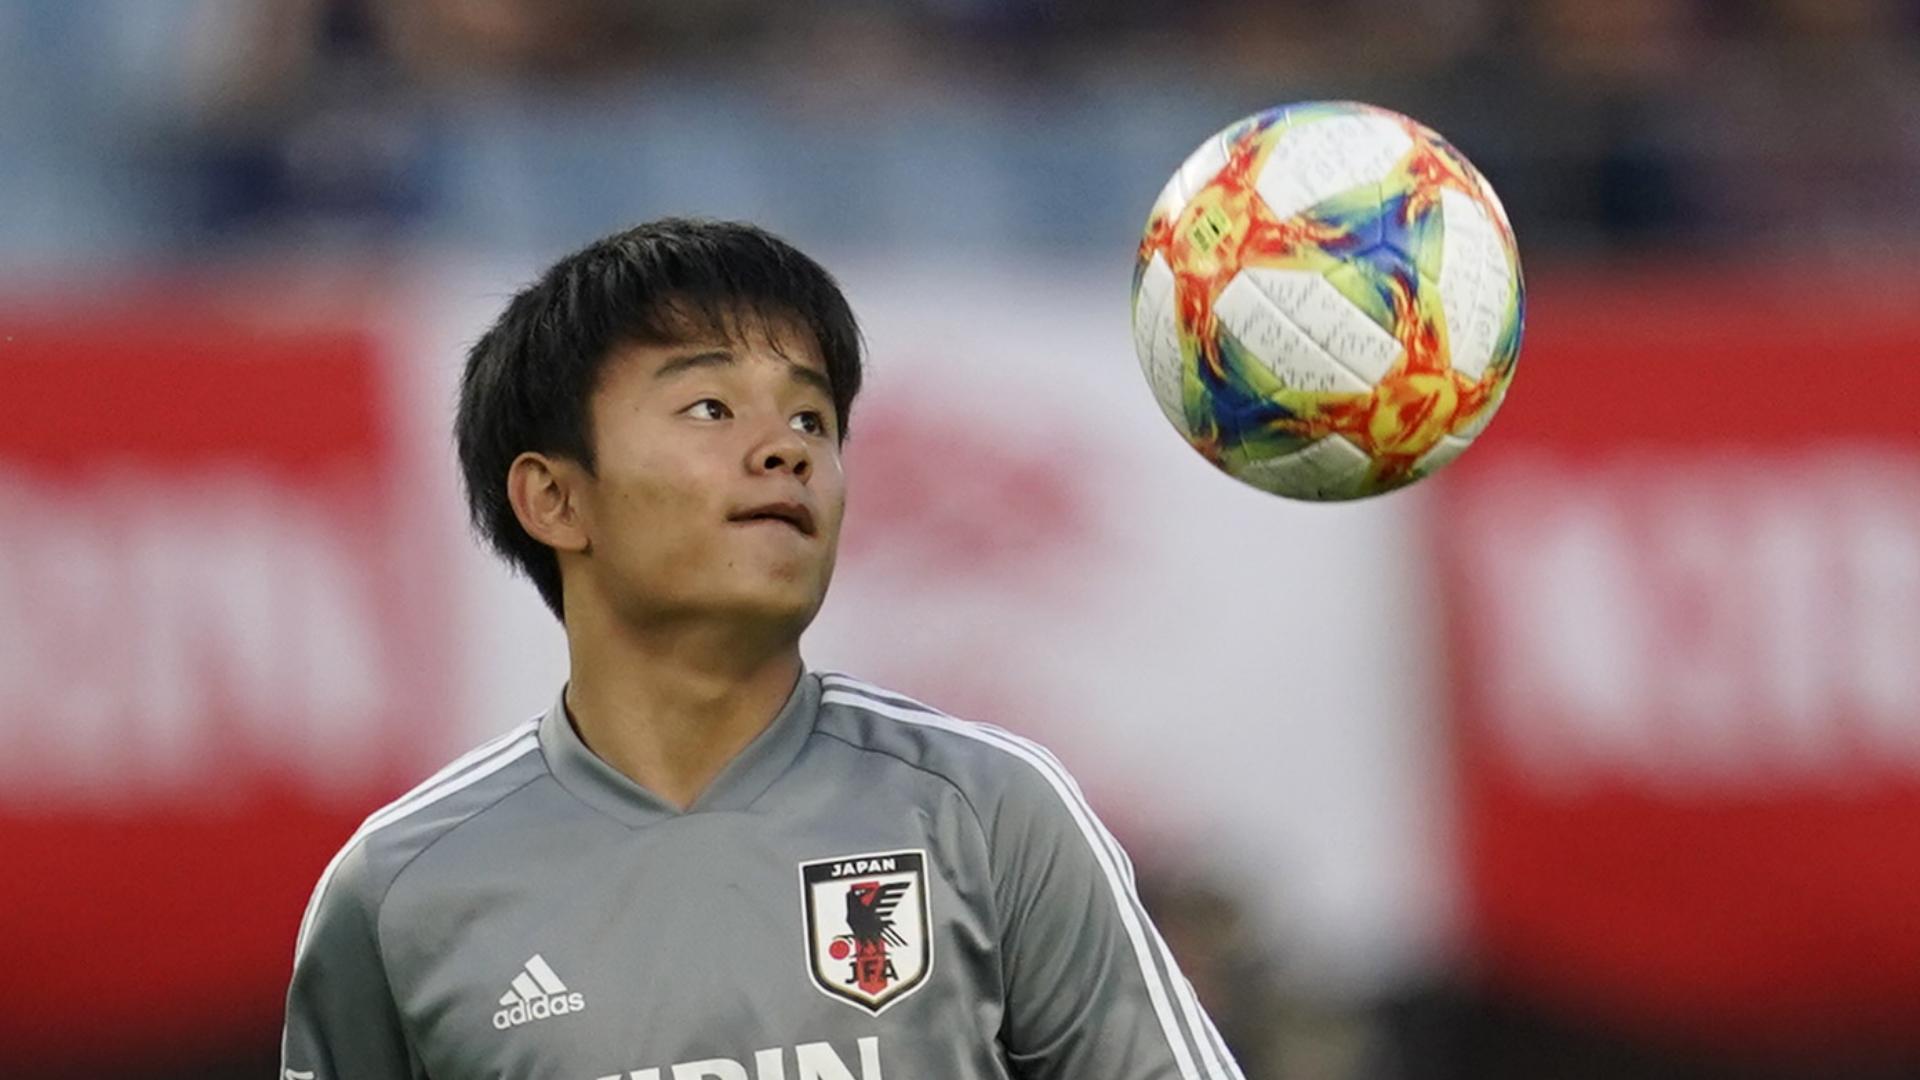 U24 Japan 6-0 Ghana U24: Real Madrid prodigy Kubo dazzles vs Black Meteors